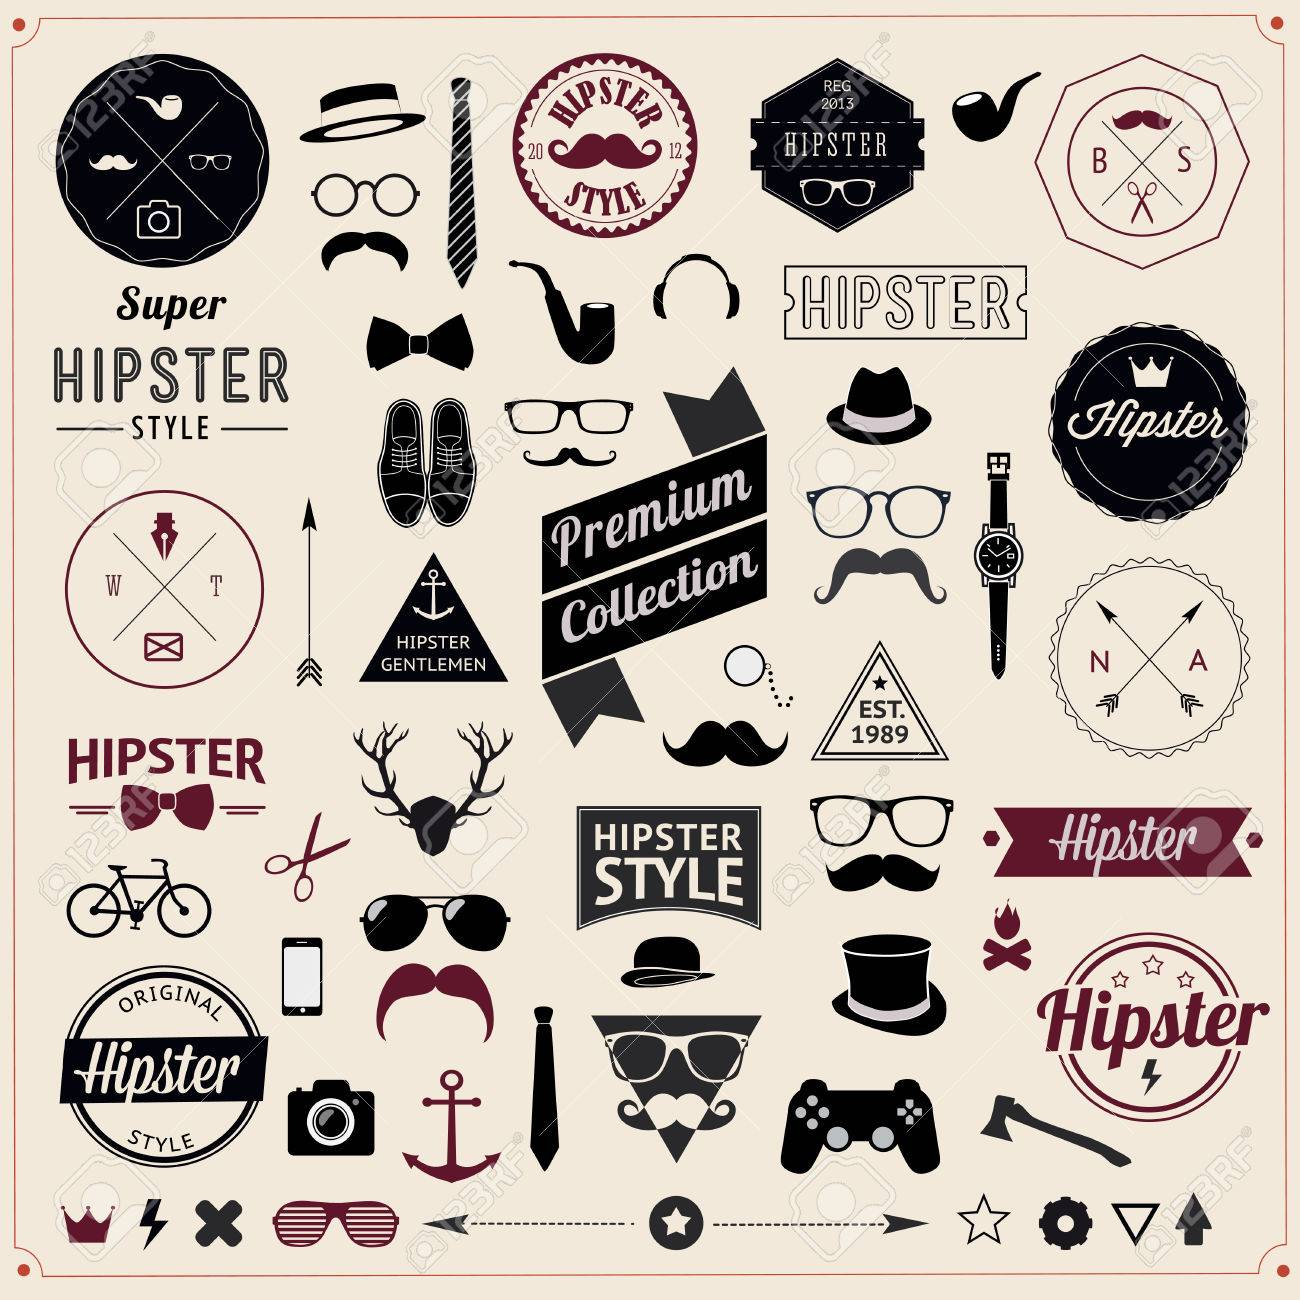 Set of Vintage styled design hipster icons - 31024424